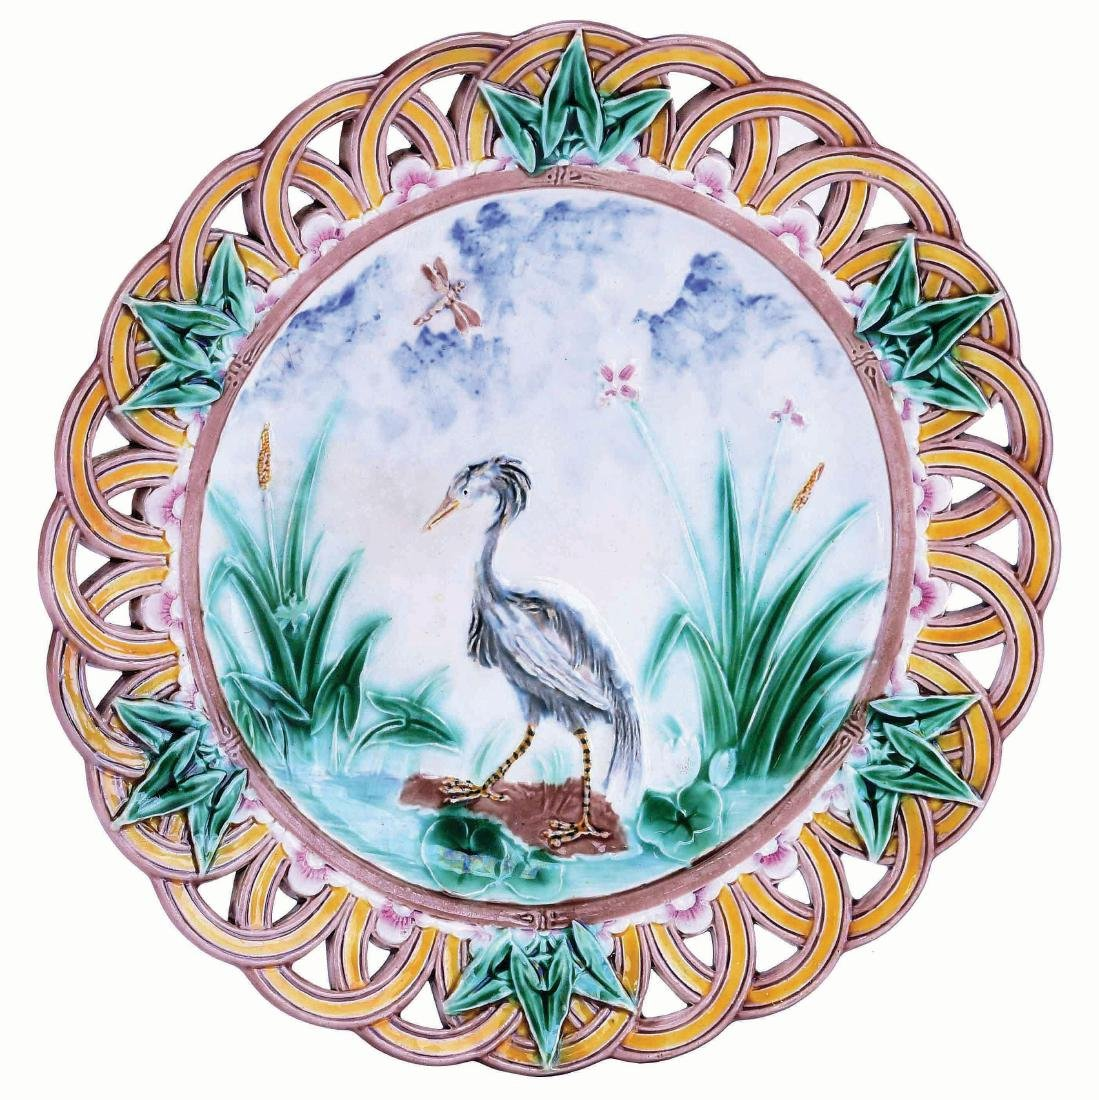 Wedgwood Majolica Dessert Plate Designed by